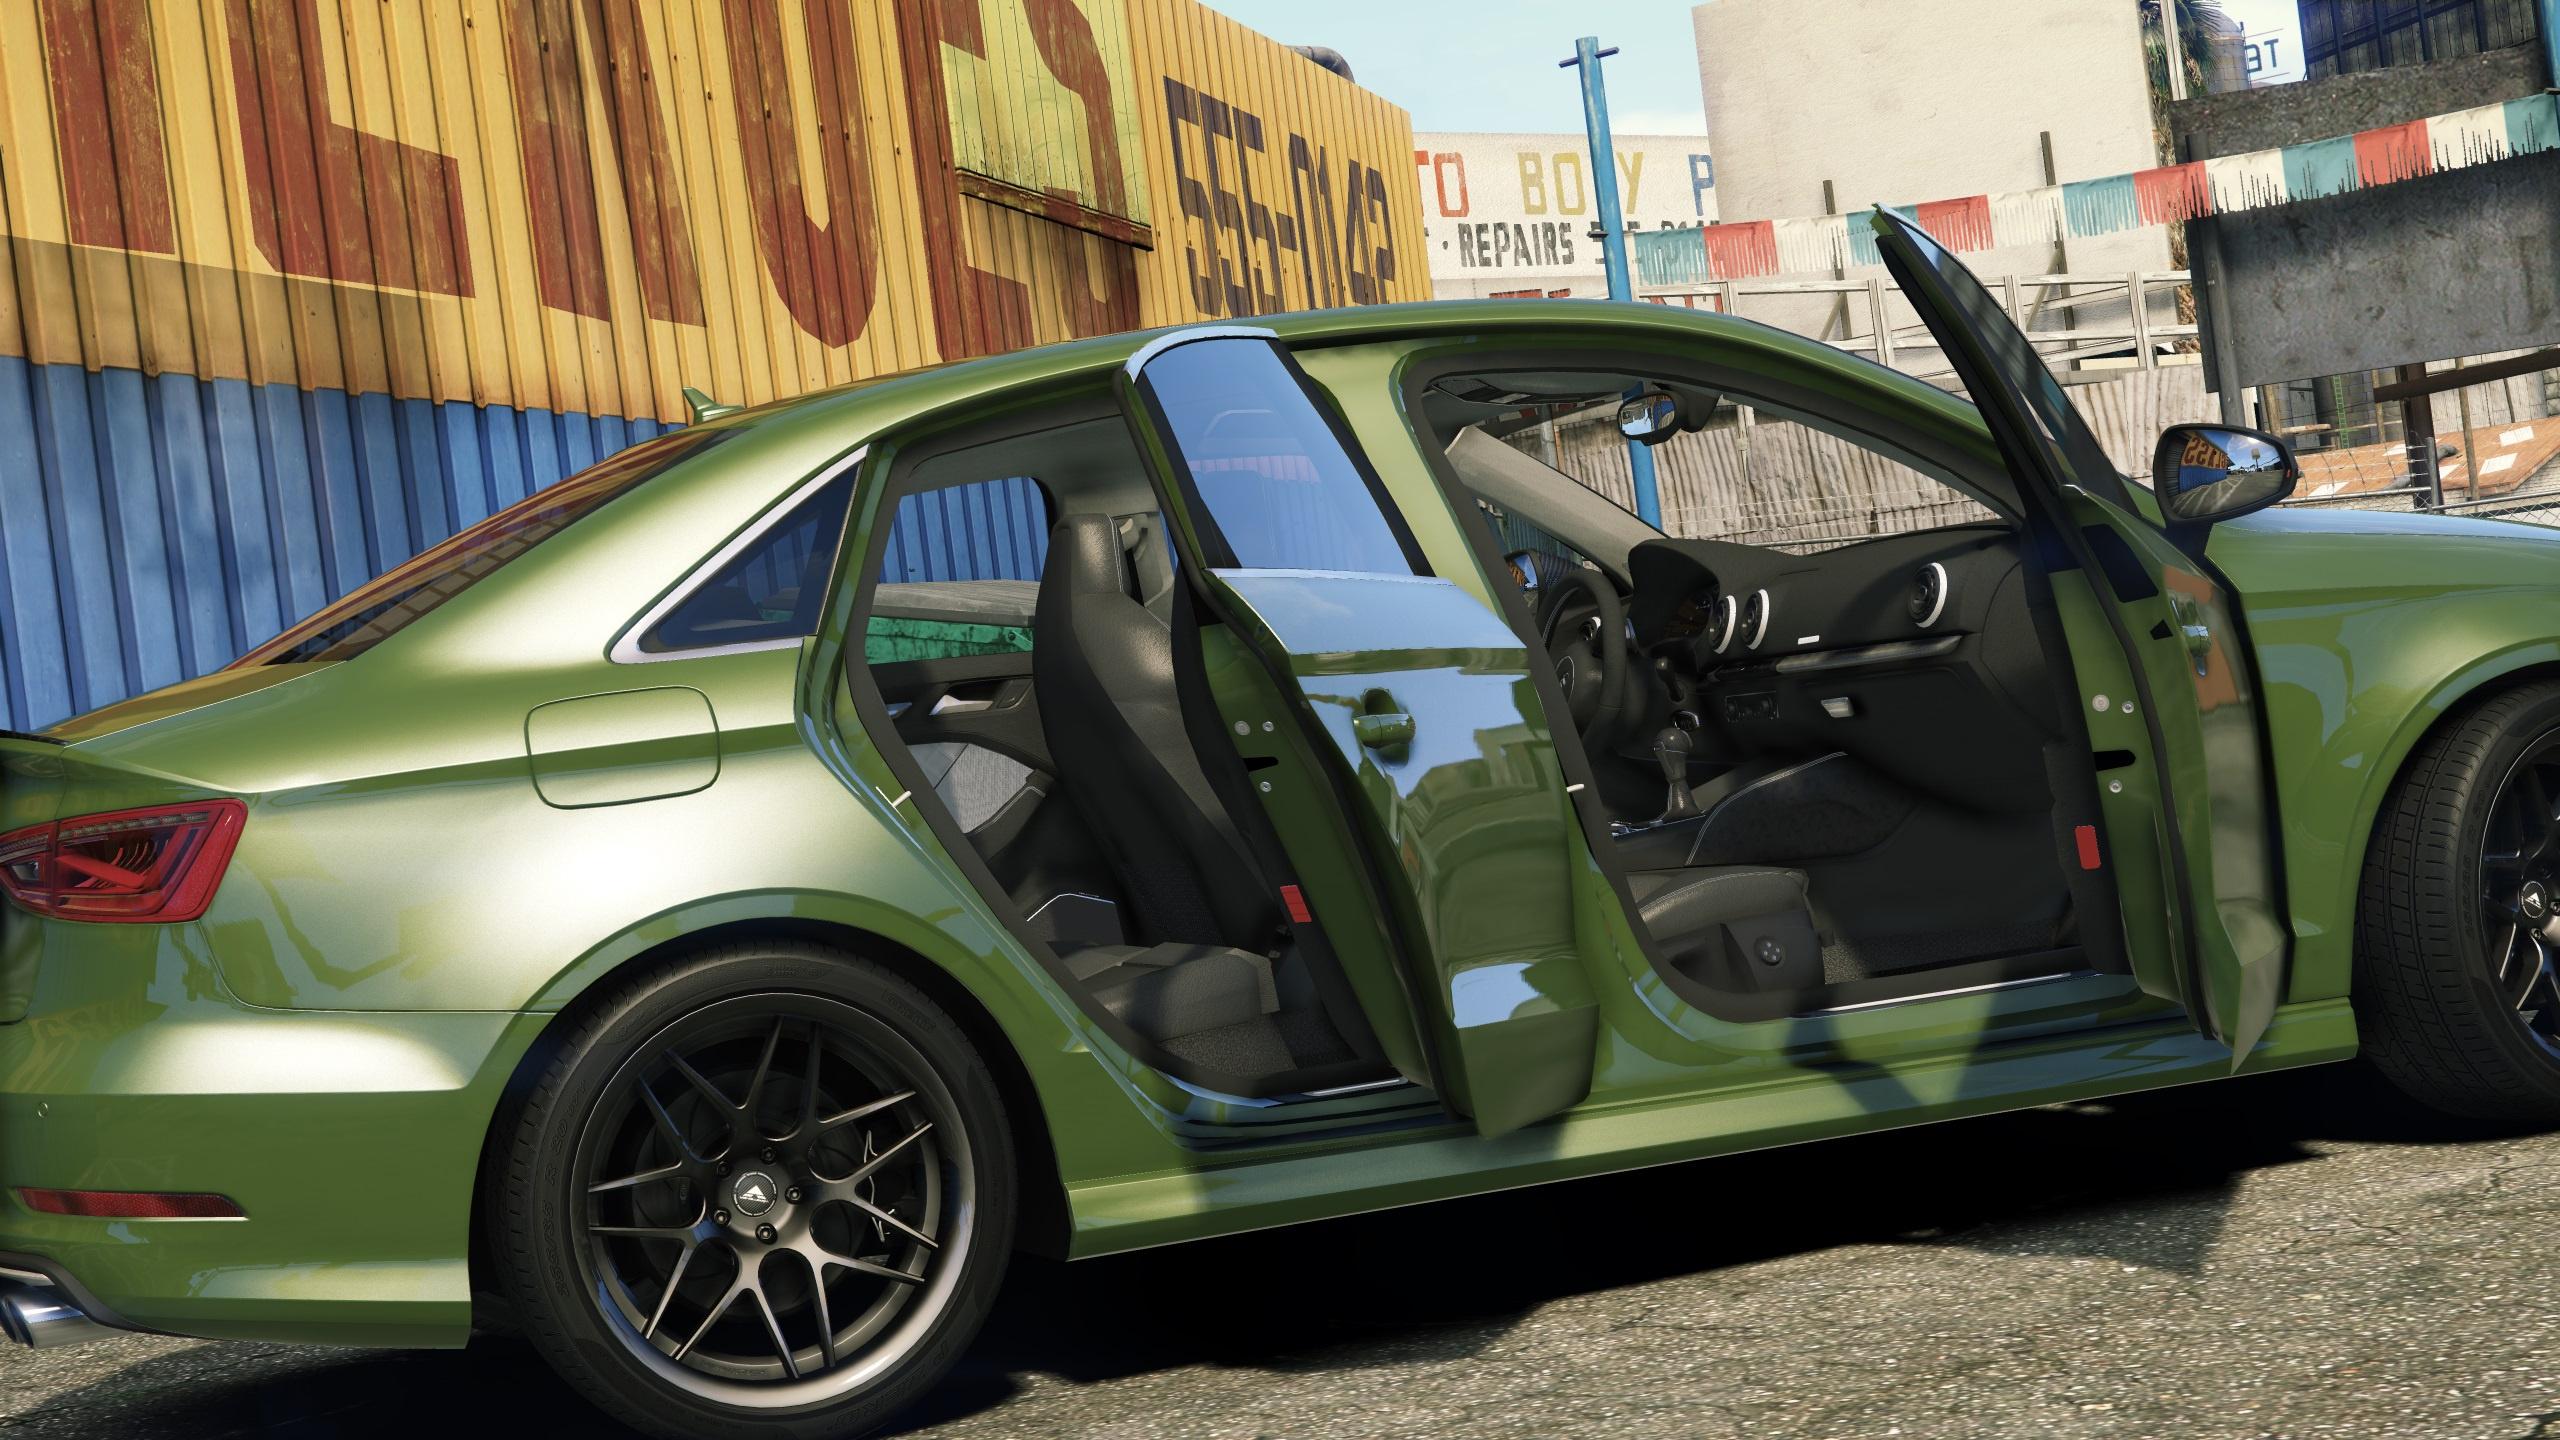 2015 Charger Sxt >> 2015 Audi A3 / S3 Sedan - GTA5-Mods.com